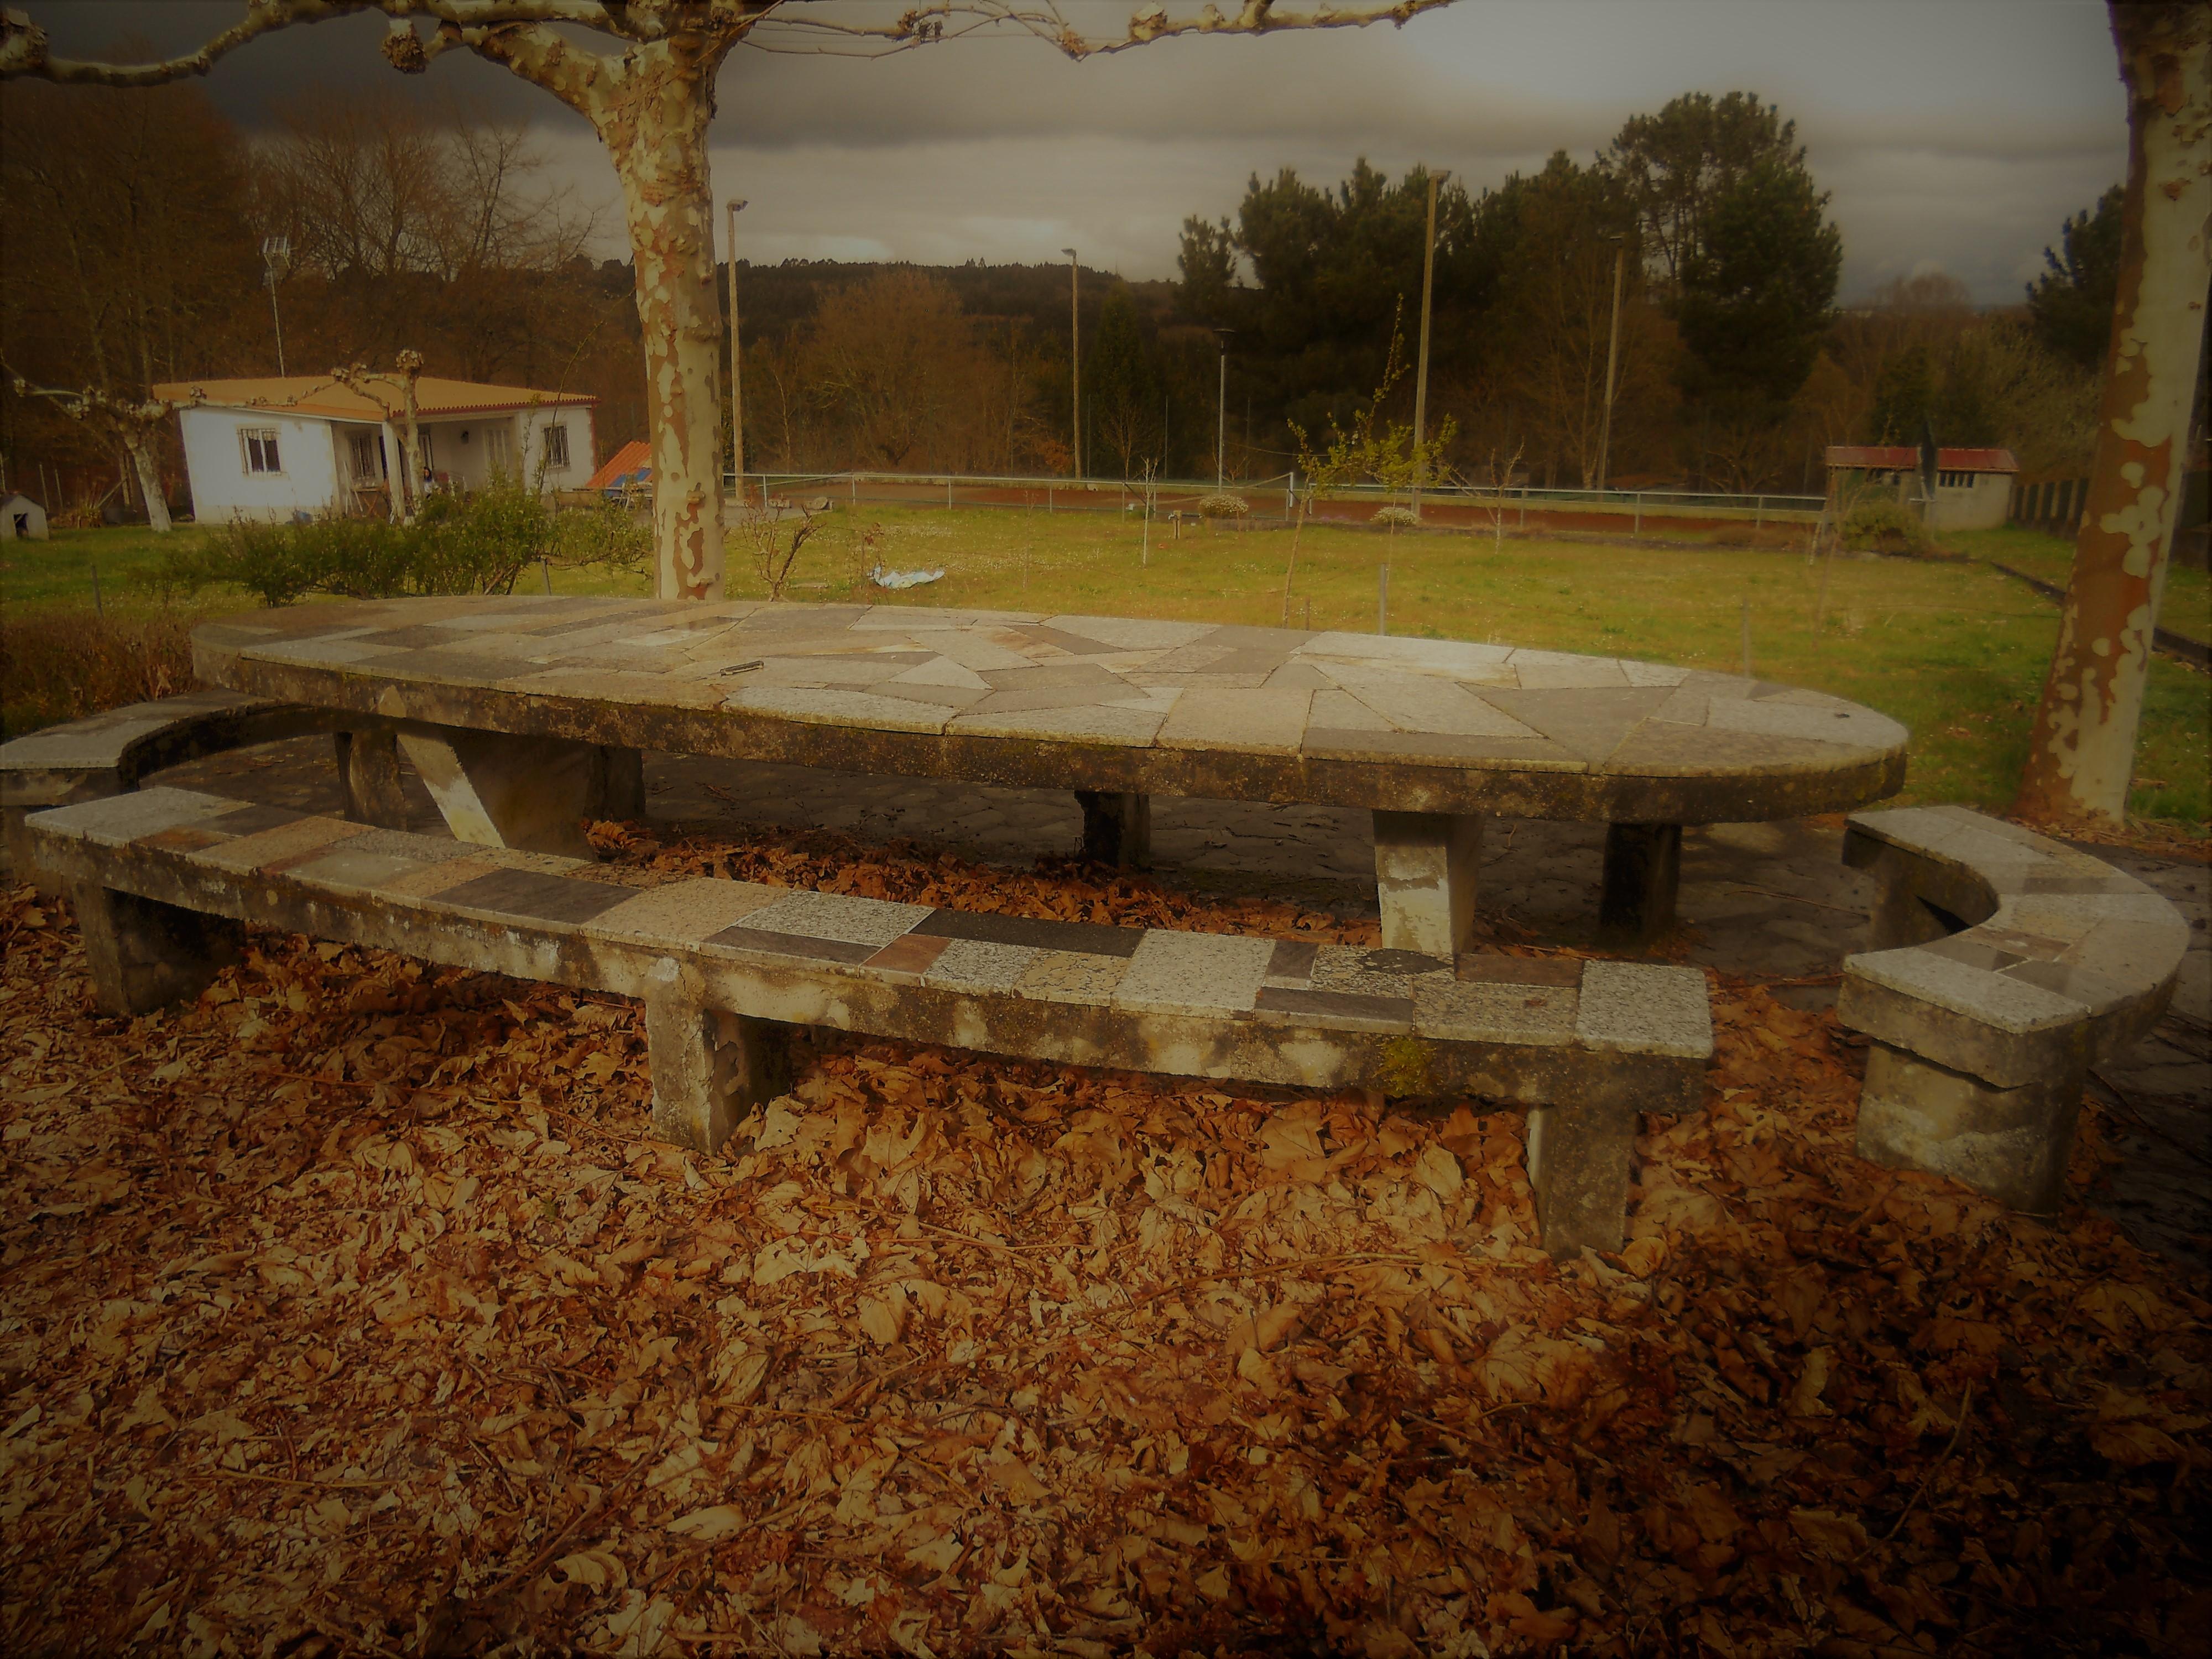 Casa con pista de tenis – próxima a Lugo